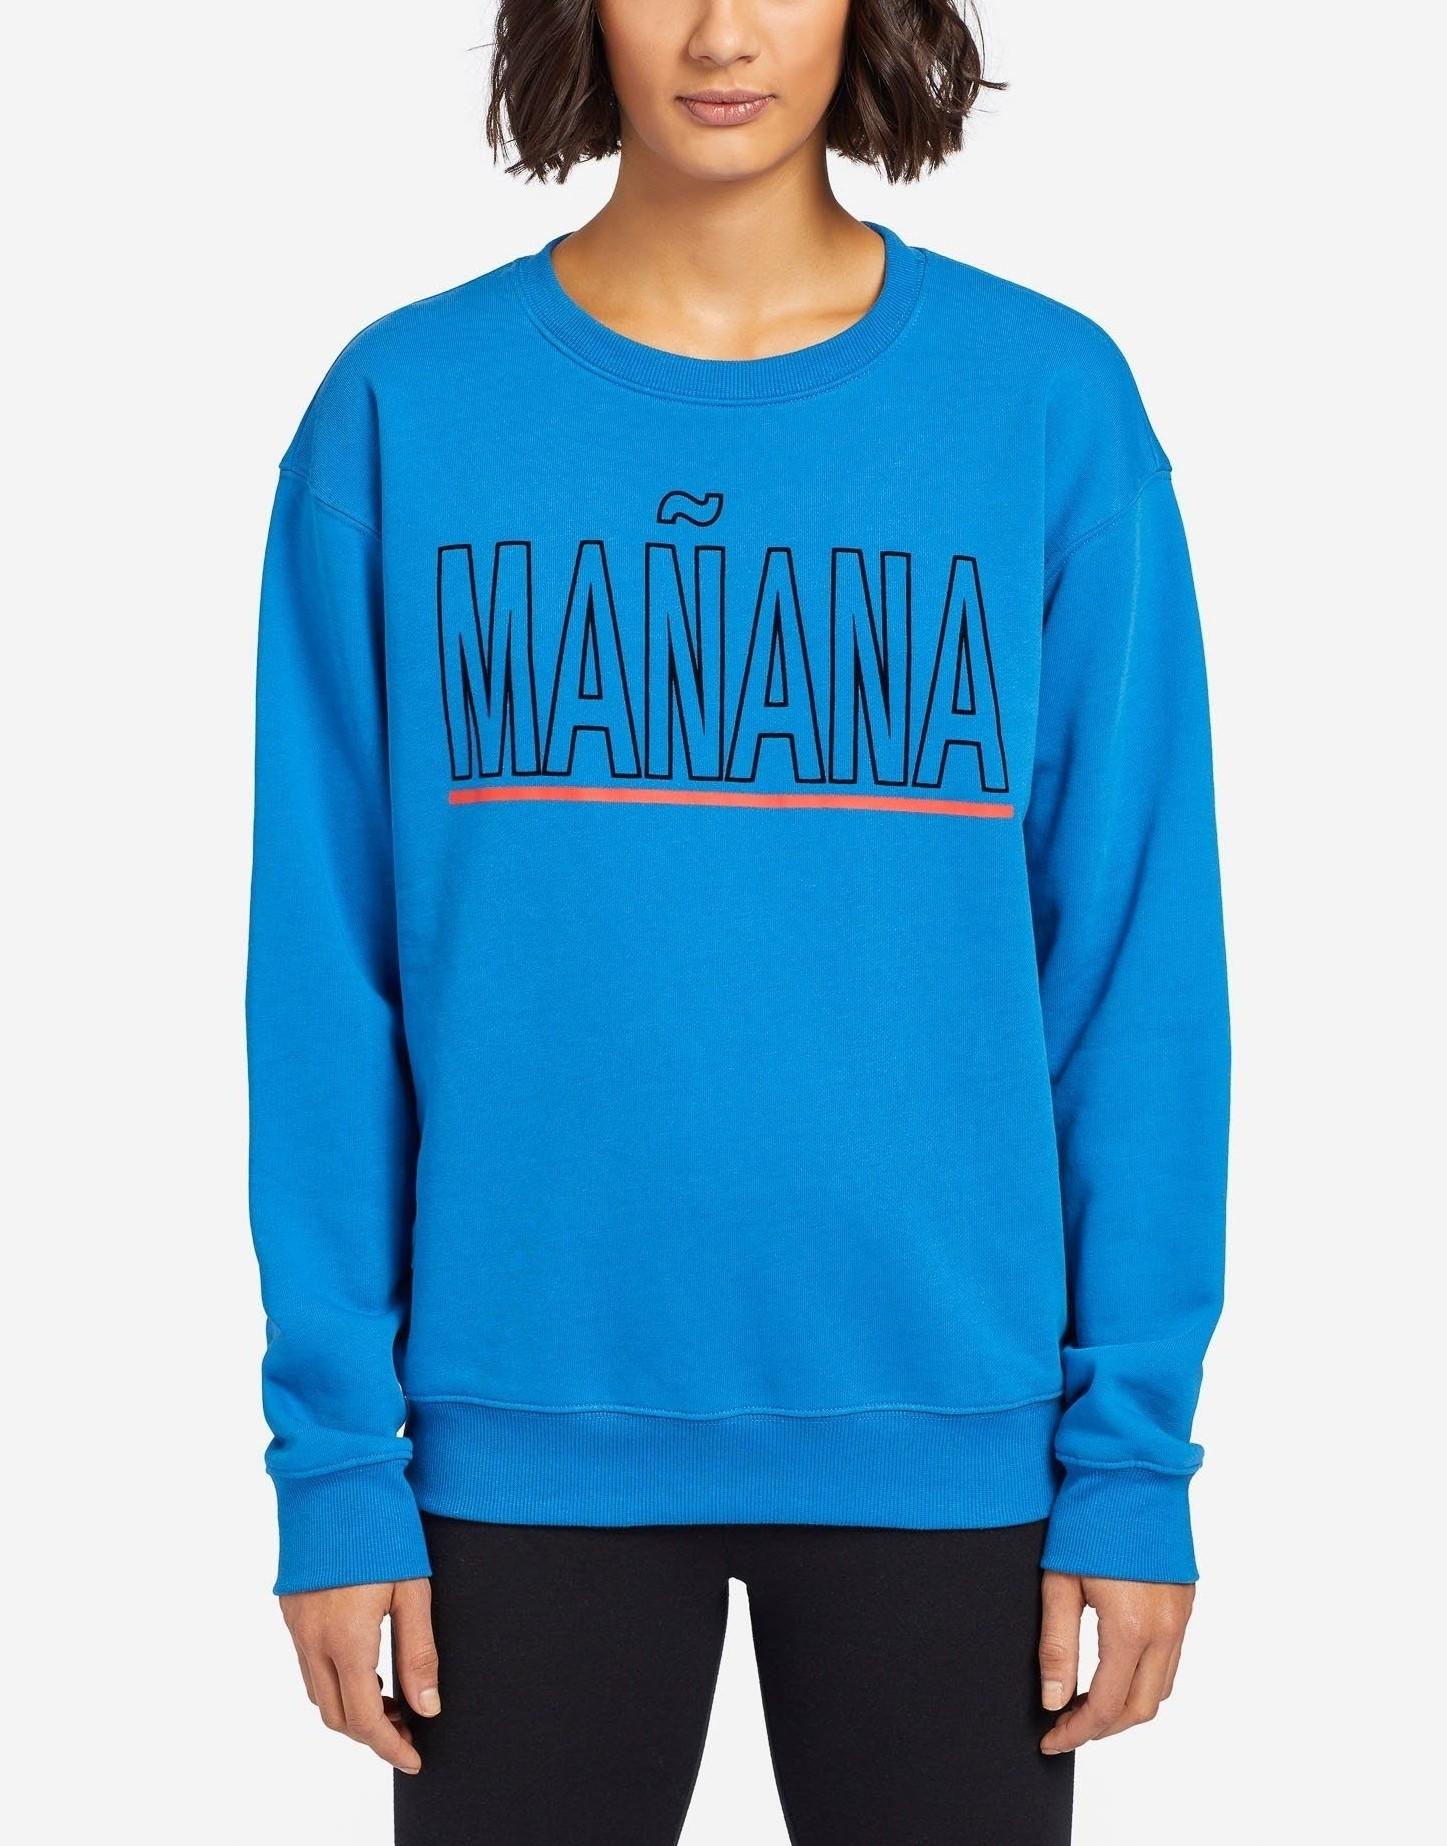 KHUJO Damen Sweatshirt Dylan Print Blau